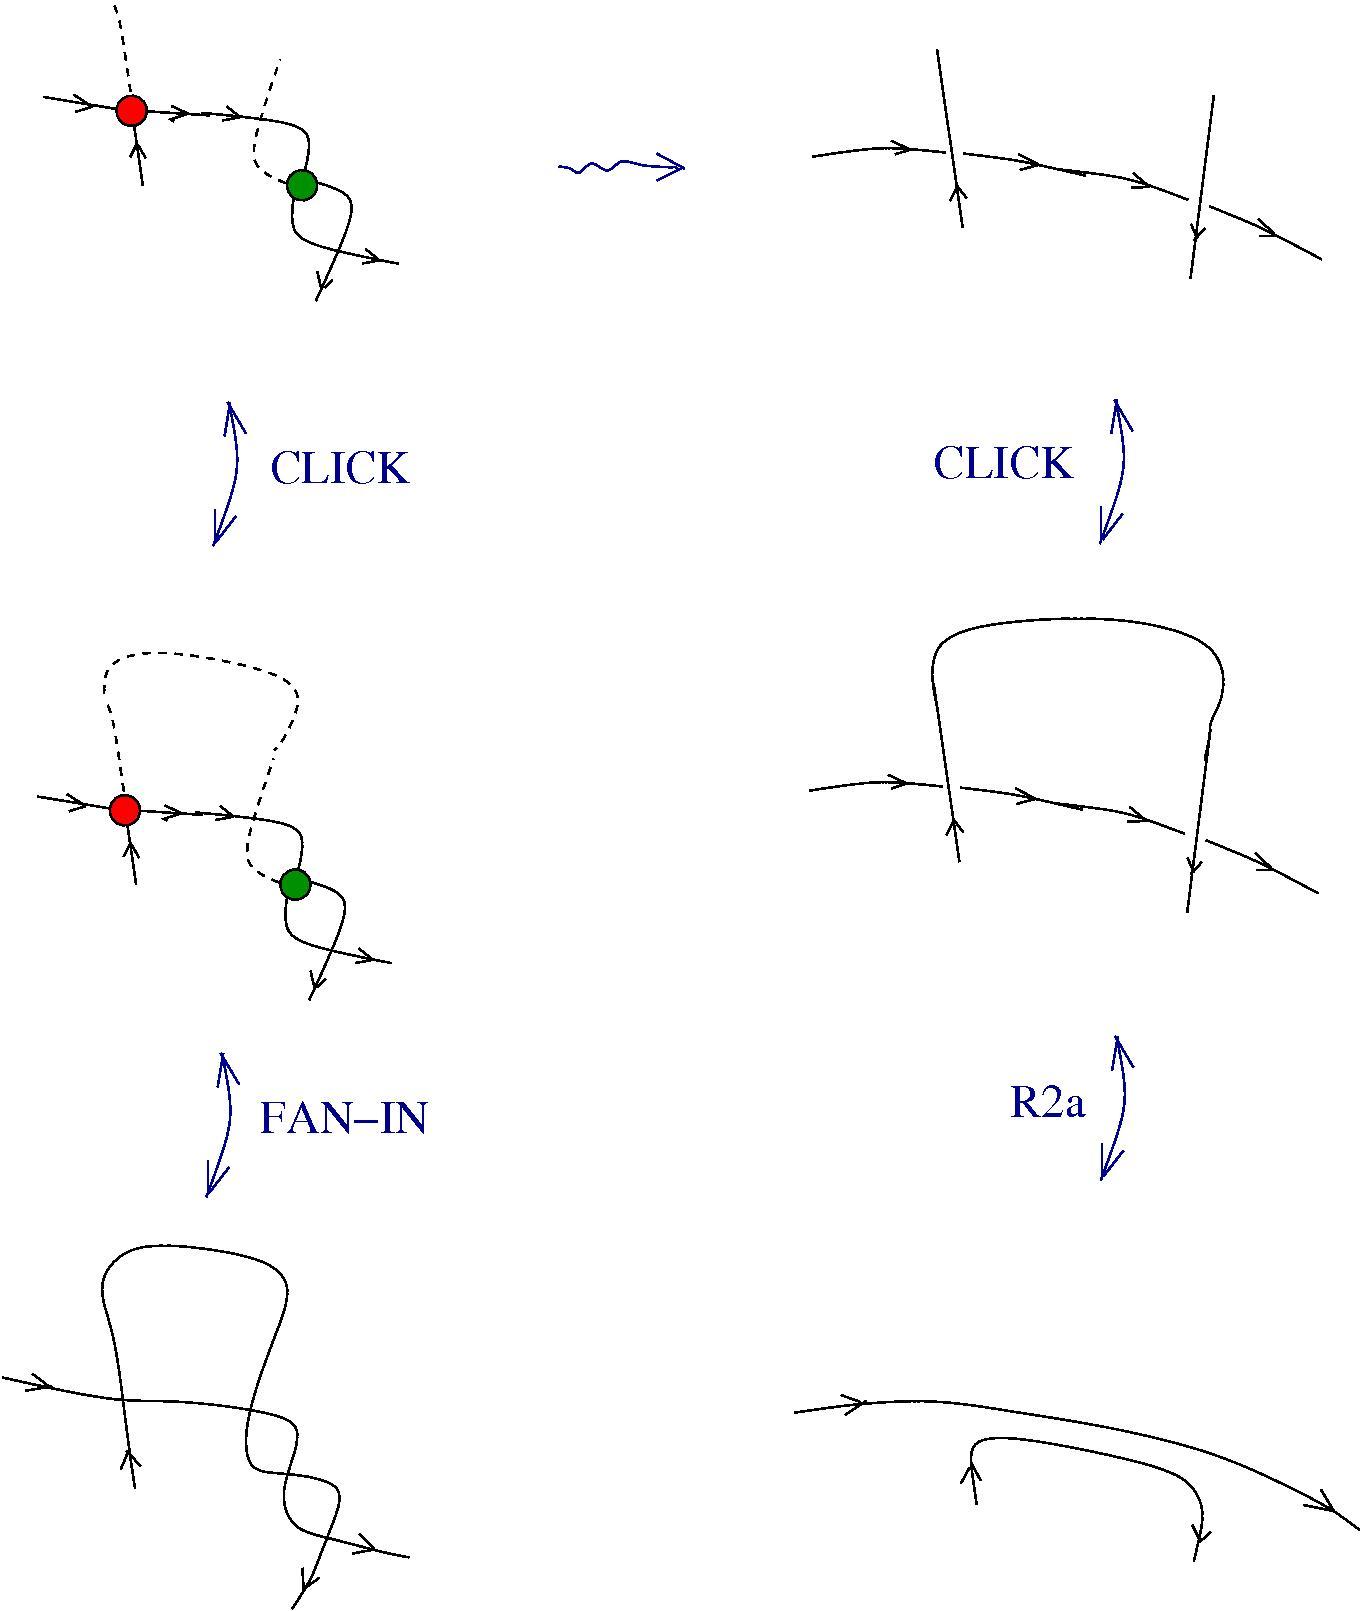 Knot Diagrams